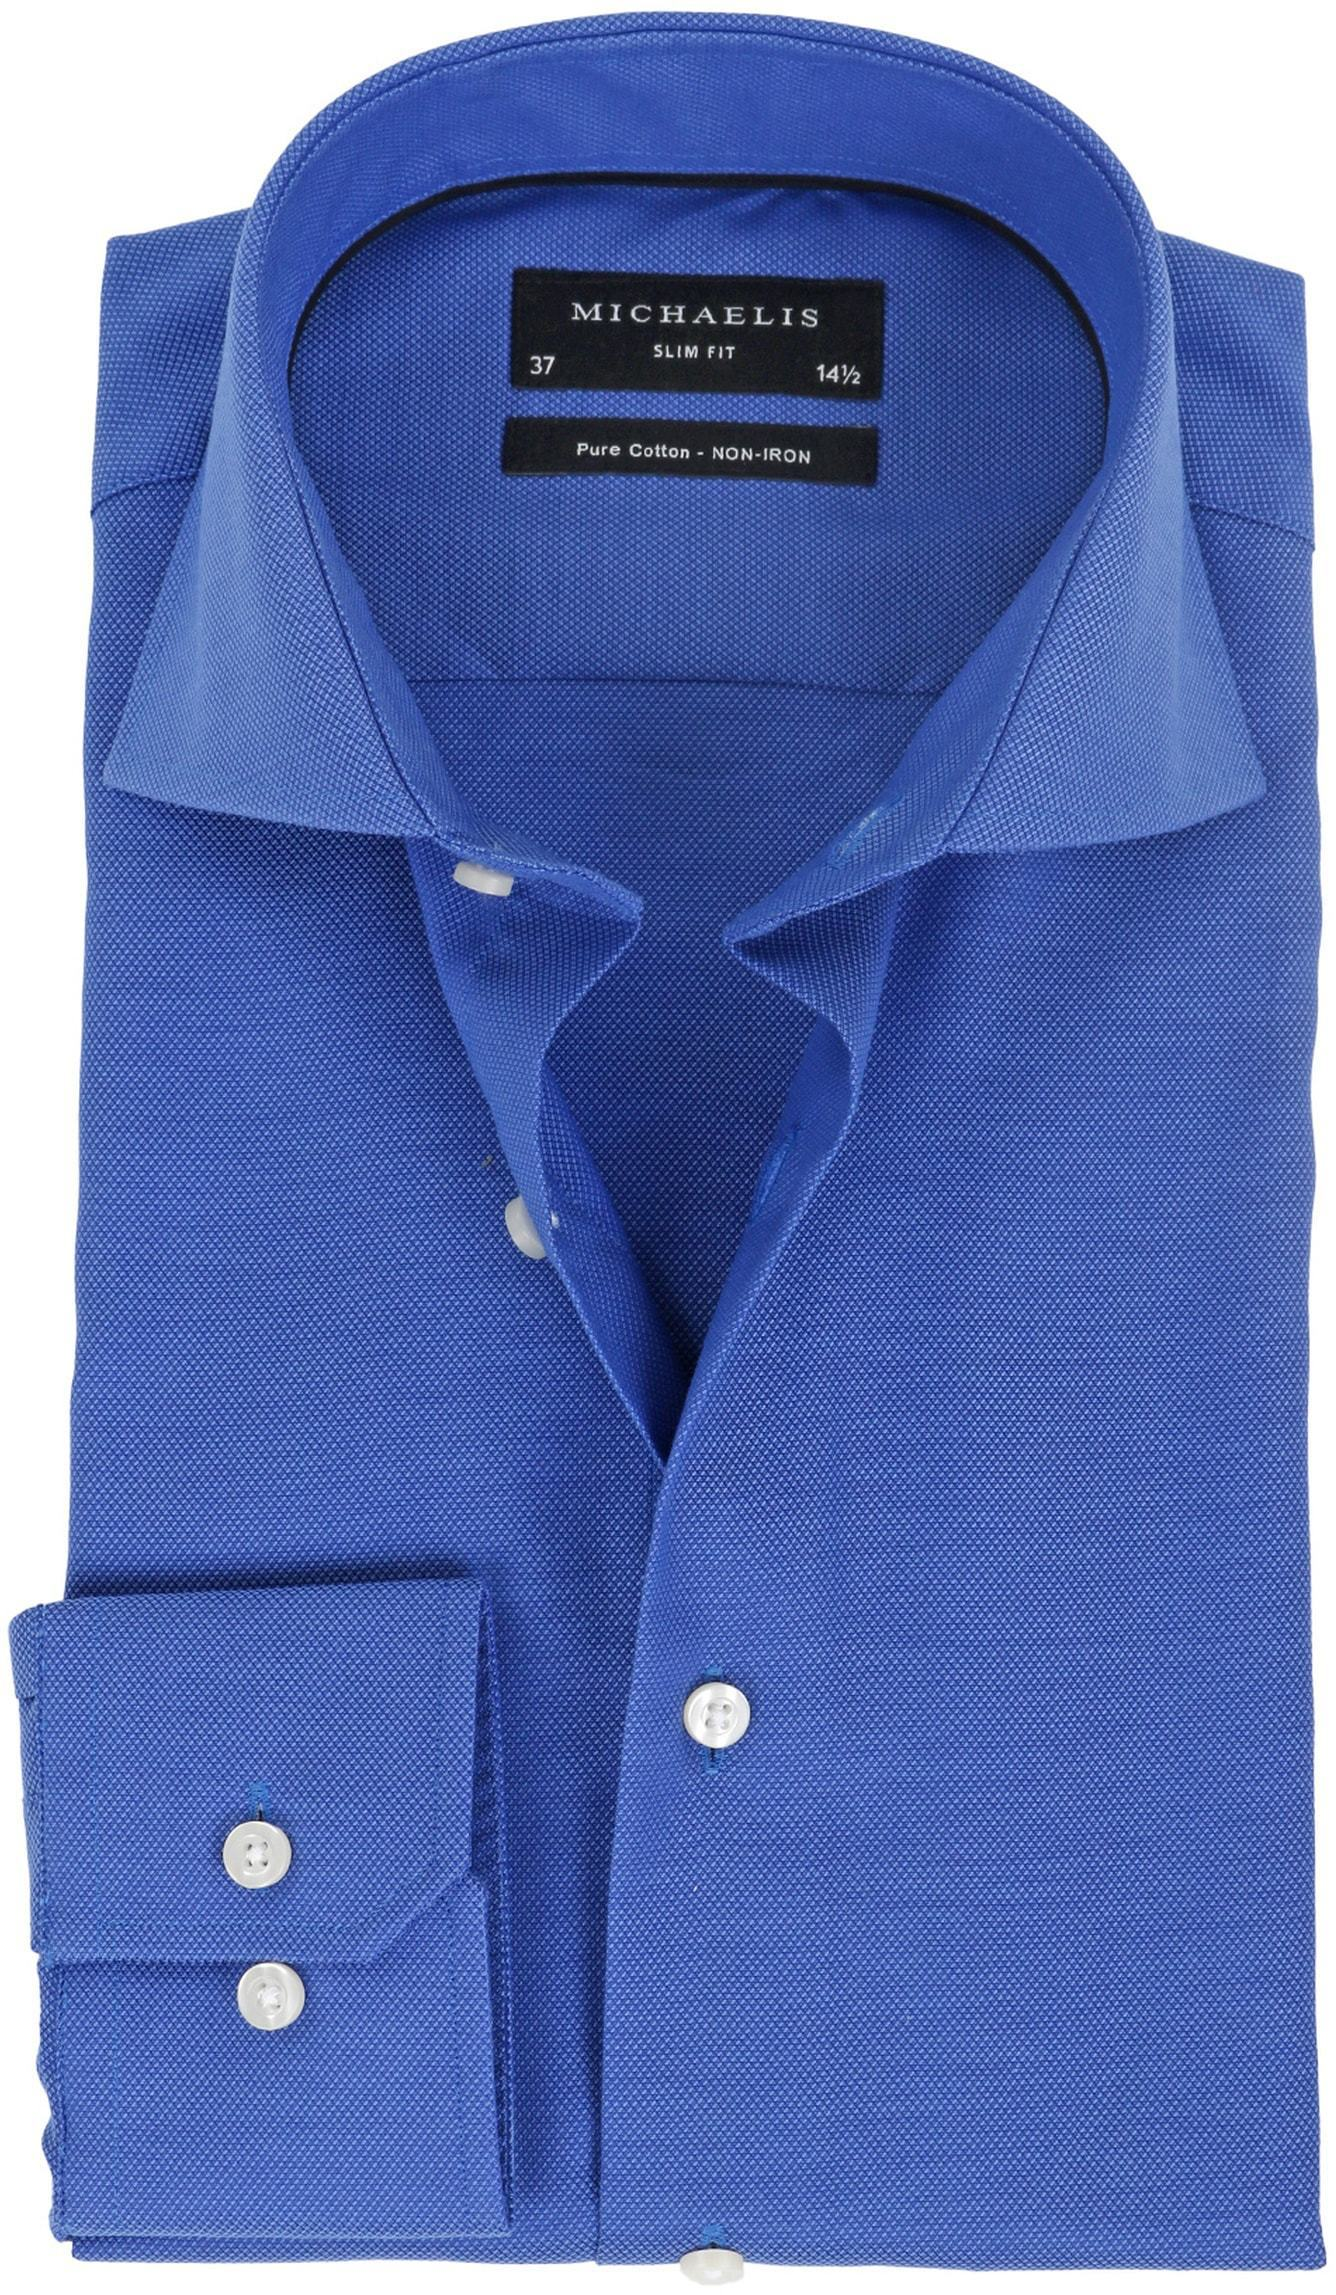 Michaelis Overhemd SlimFit Blauw foto 0